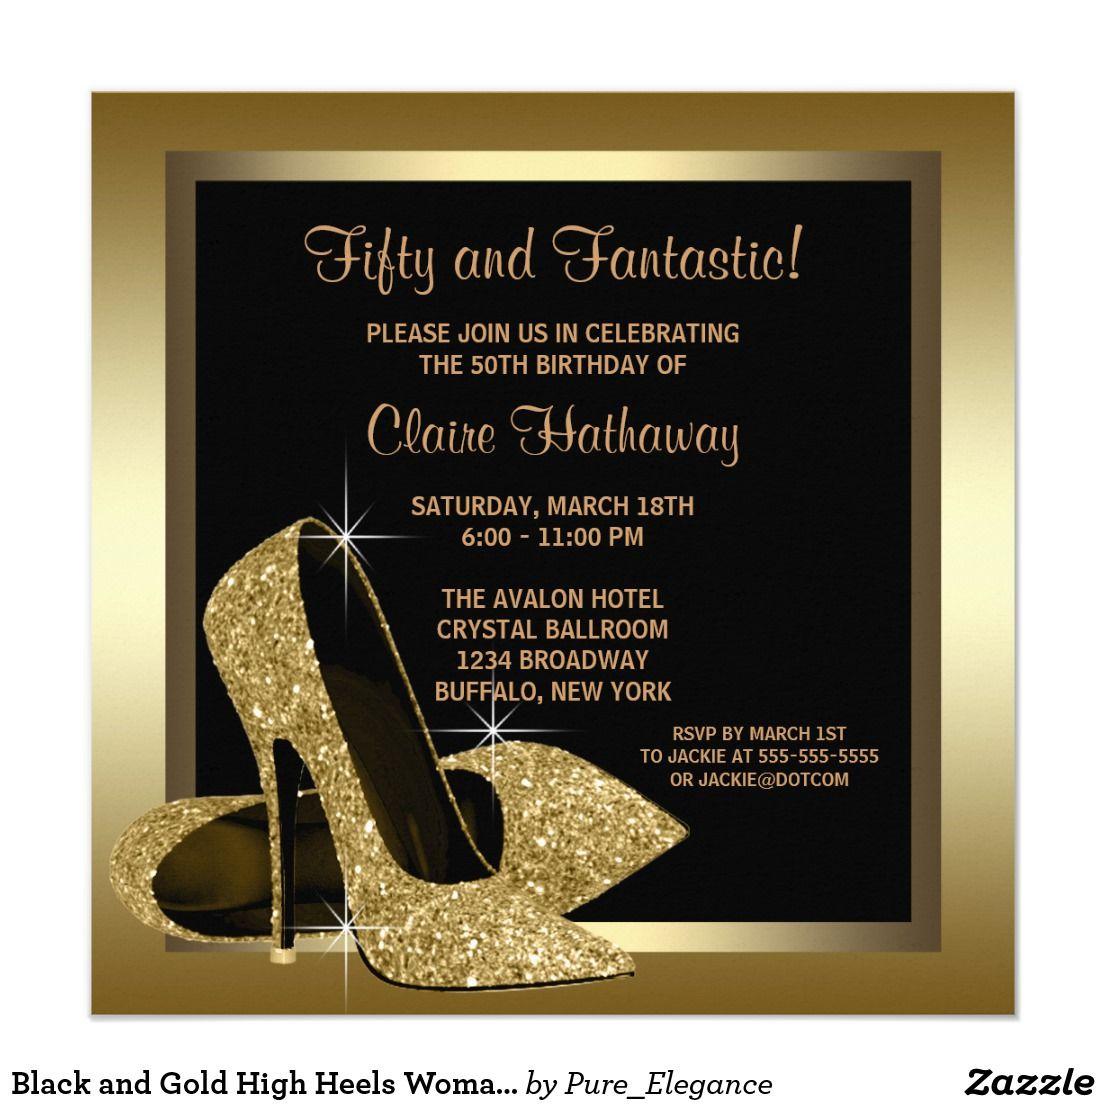 Black and Gold High Heels Womans 50th Birthday Card | 50th birthday ...